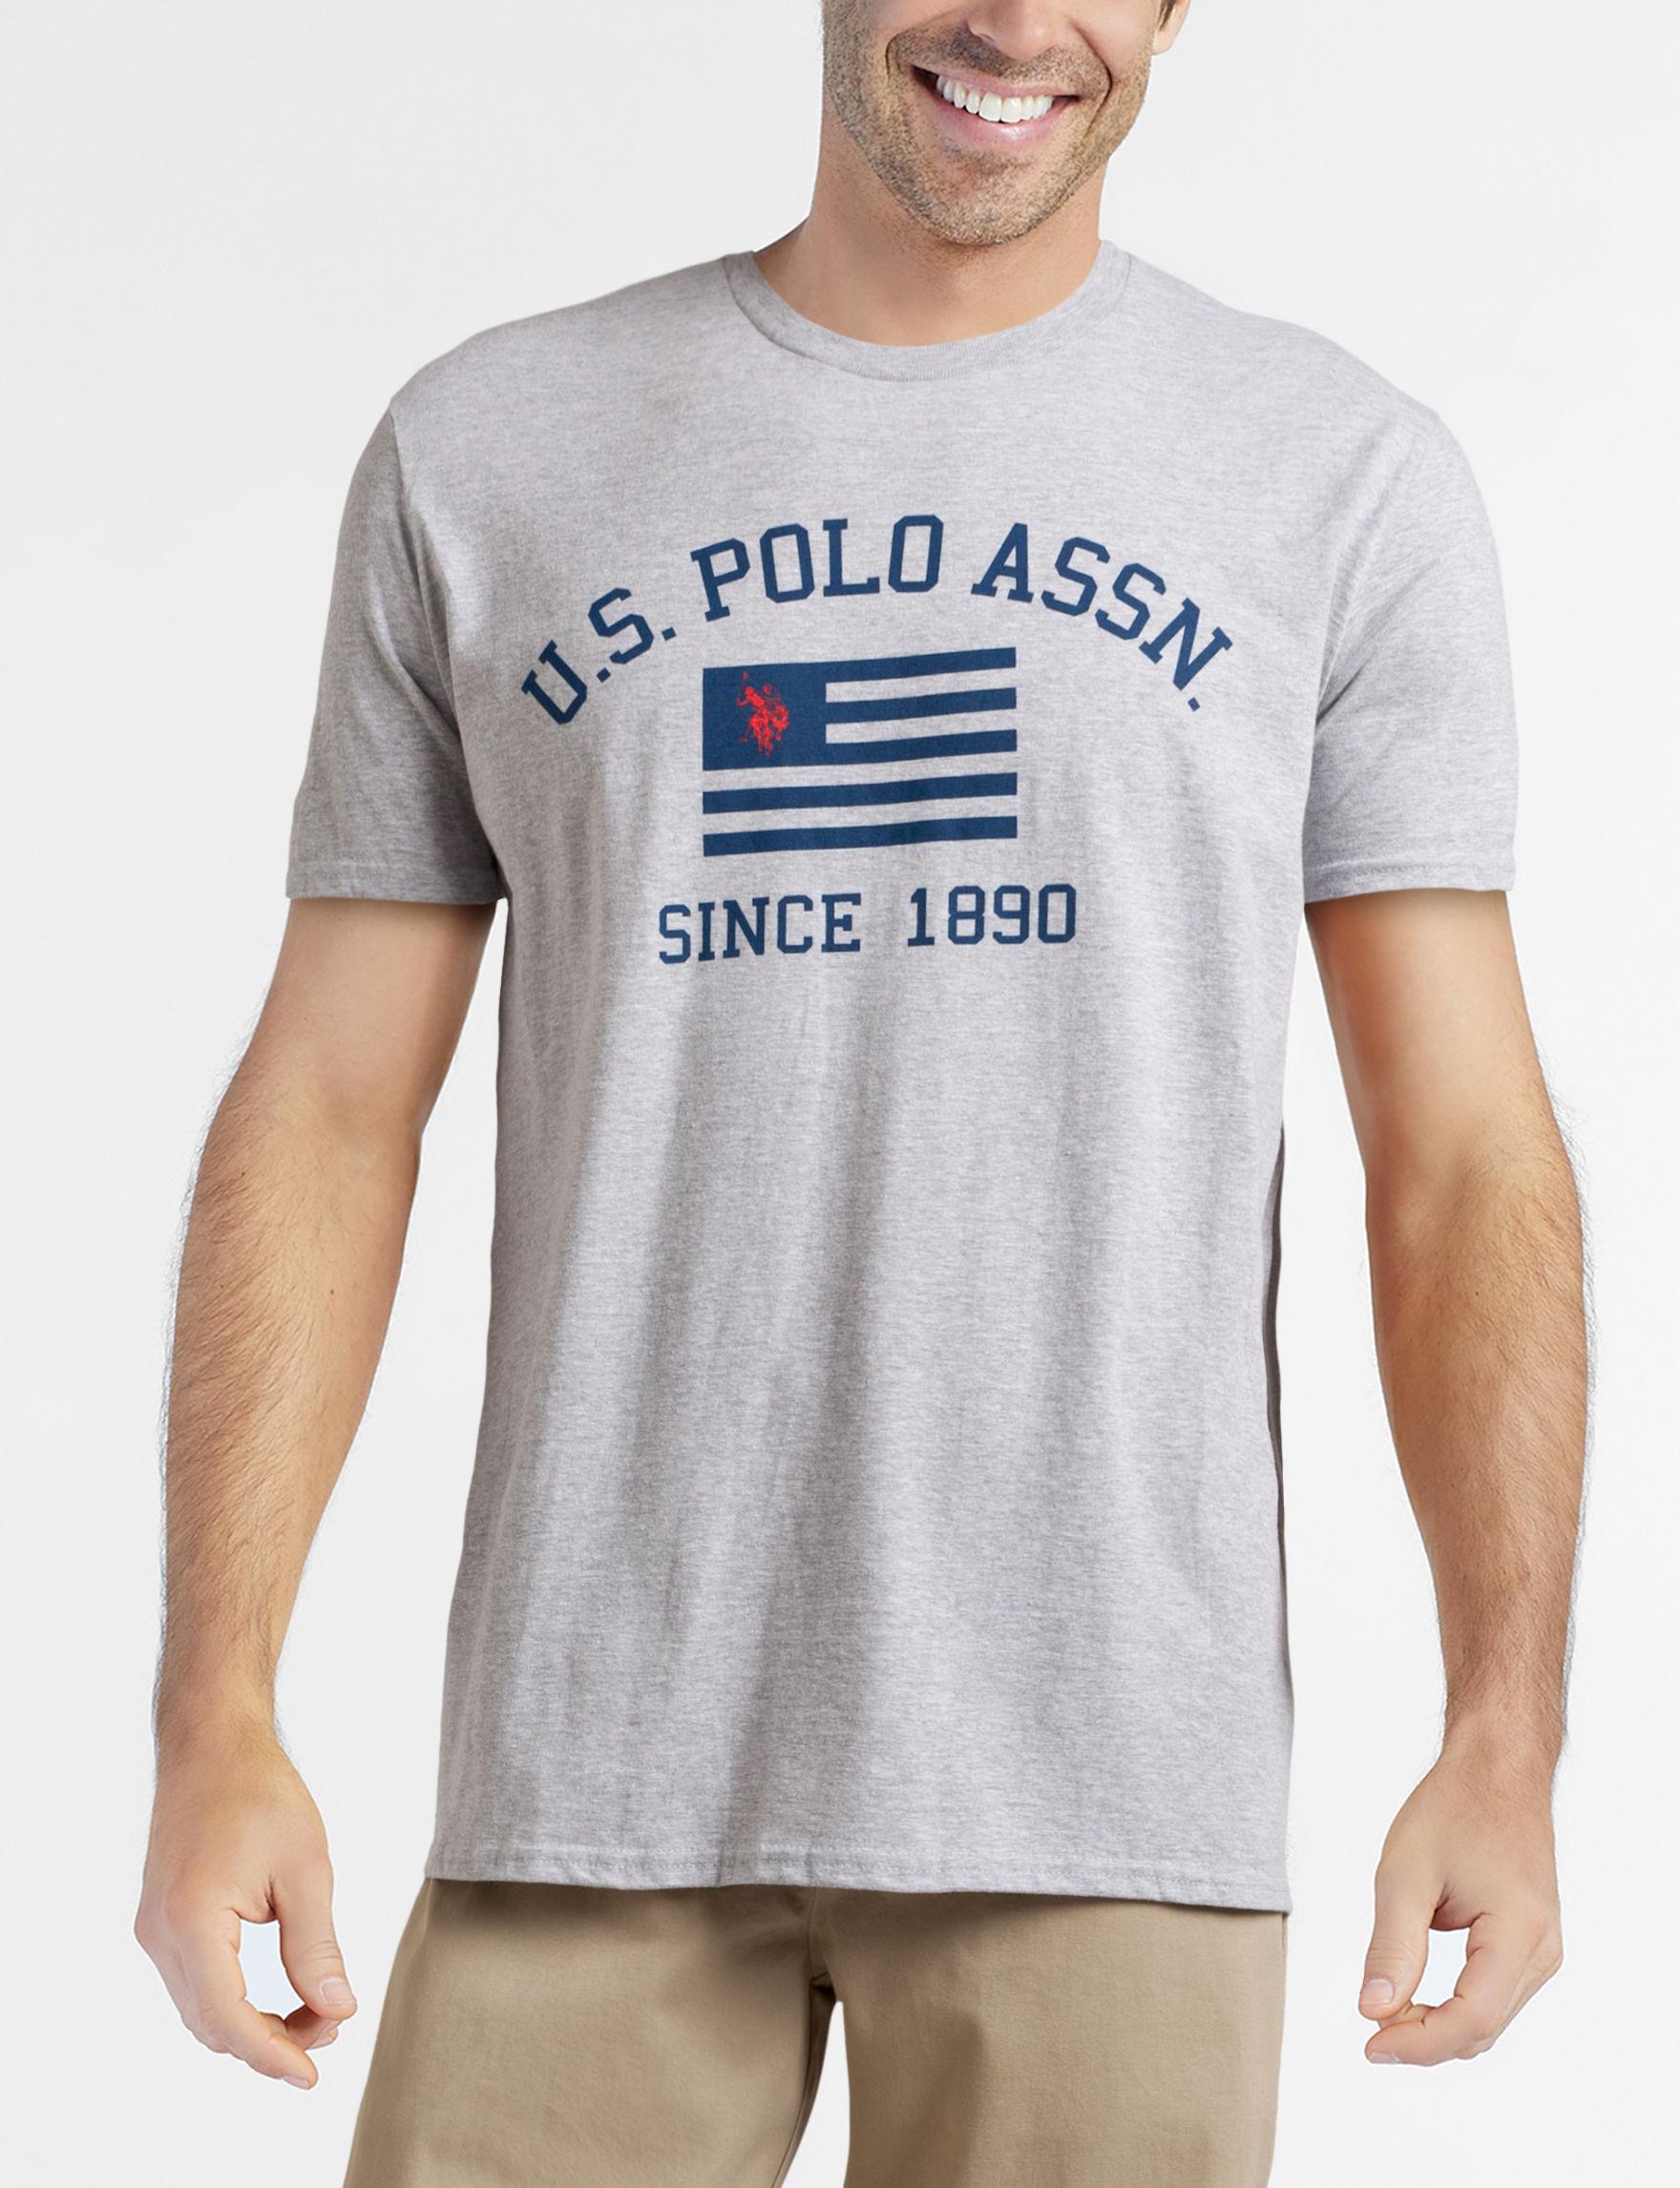 U.S. Polo Assn. Grey Tees & Tanks